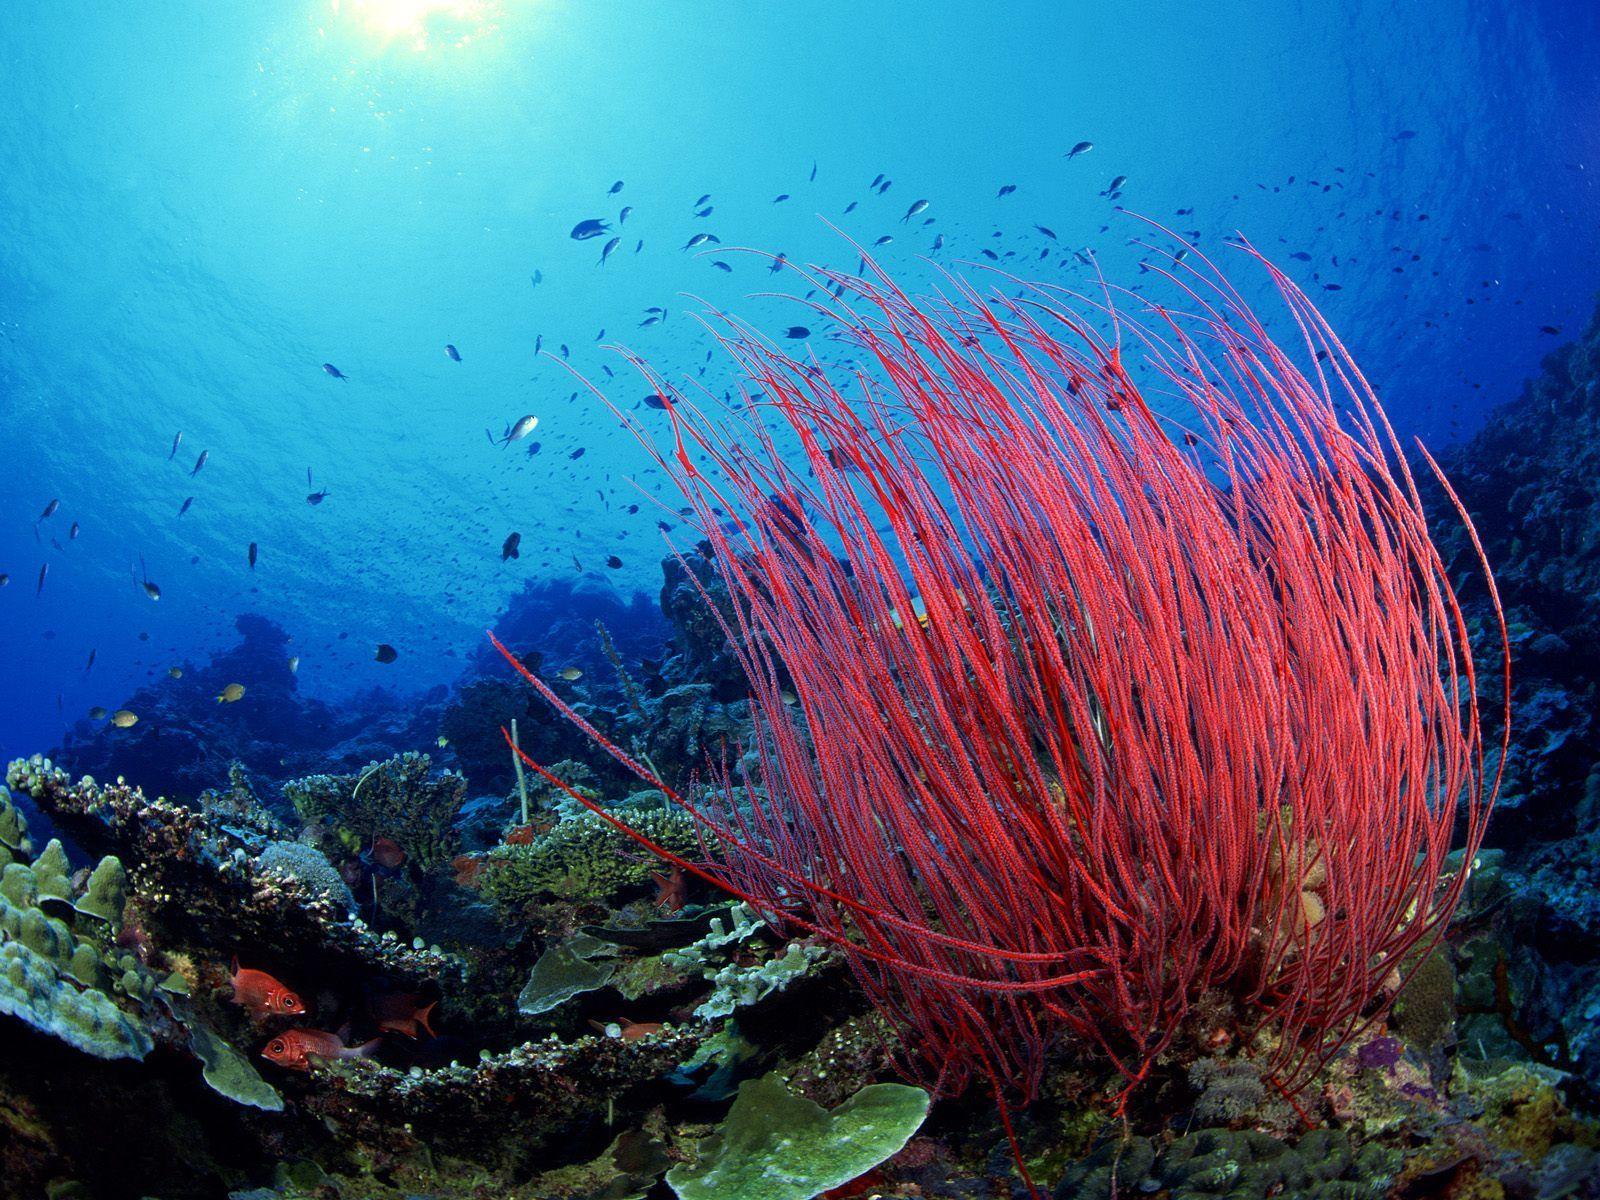 Sea Whip Coral Animal Wallpaper Fish Underwater Seaweed